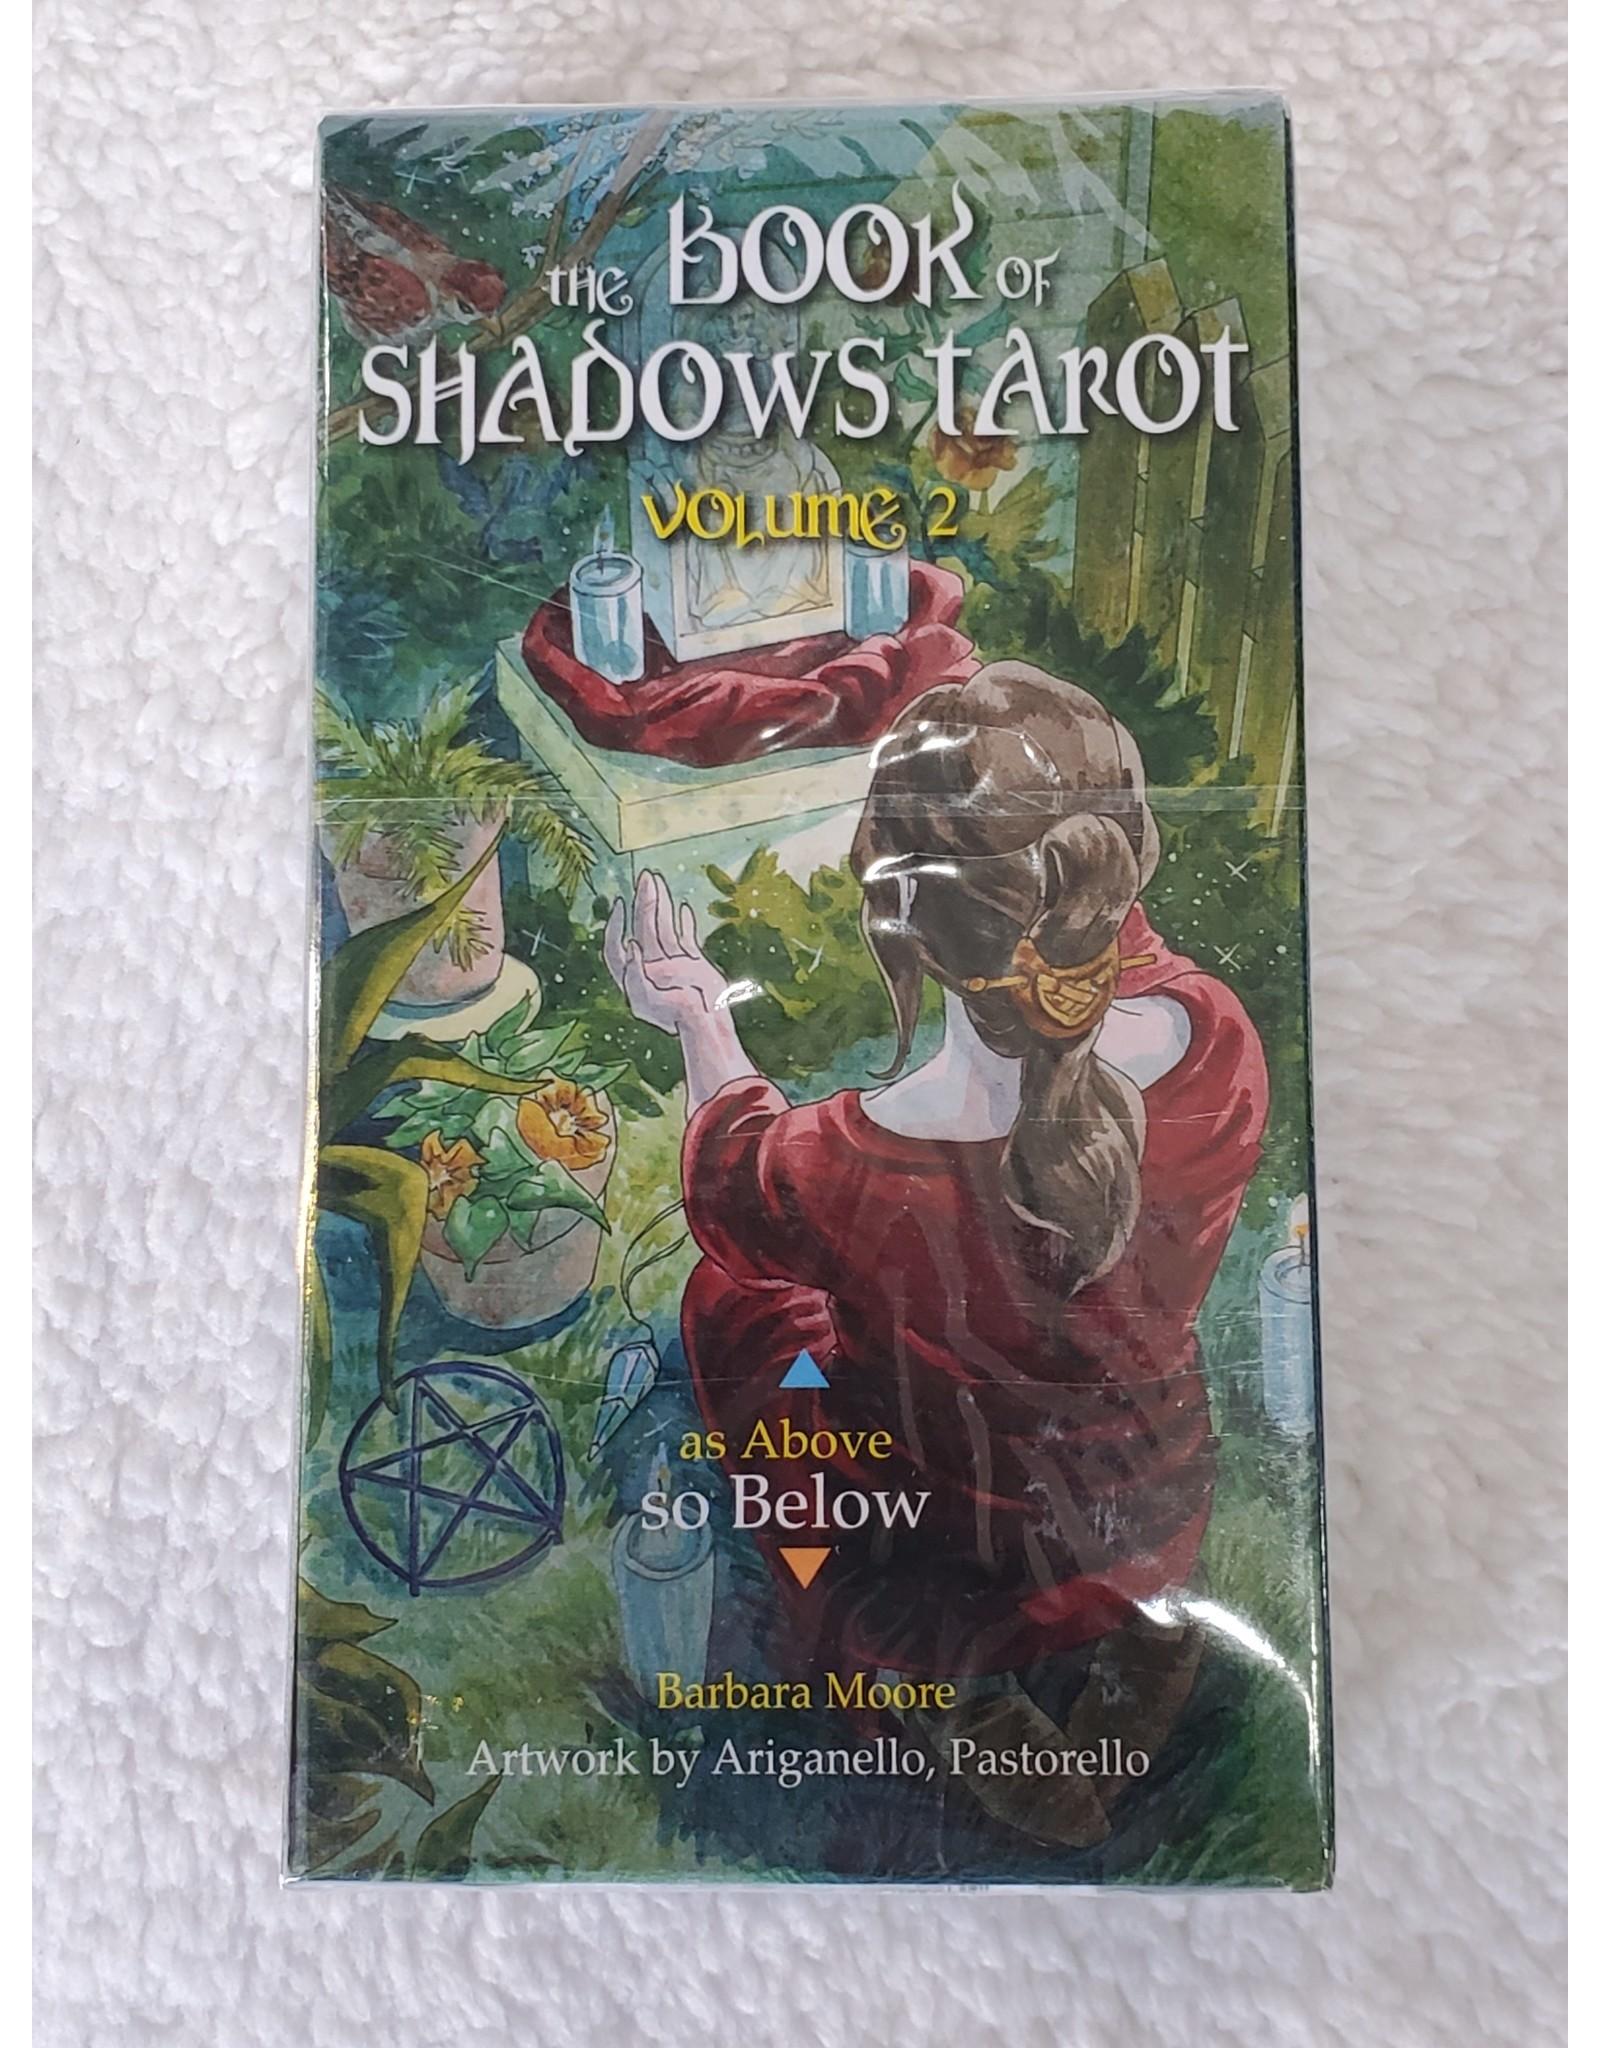 The Book of Shadows Tarot | Volume 2 | So Below